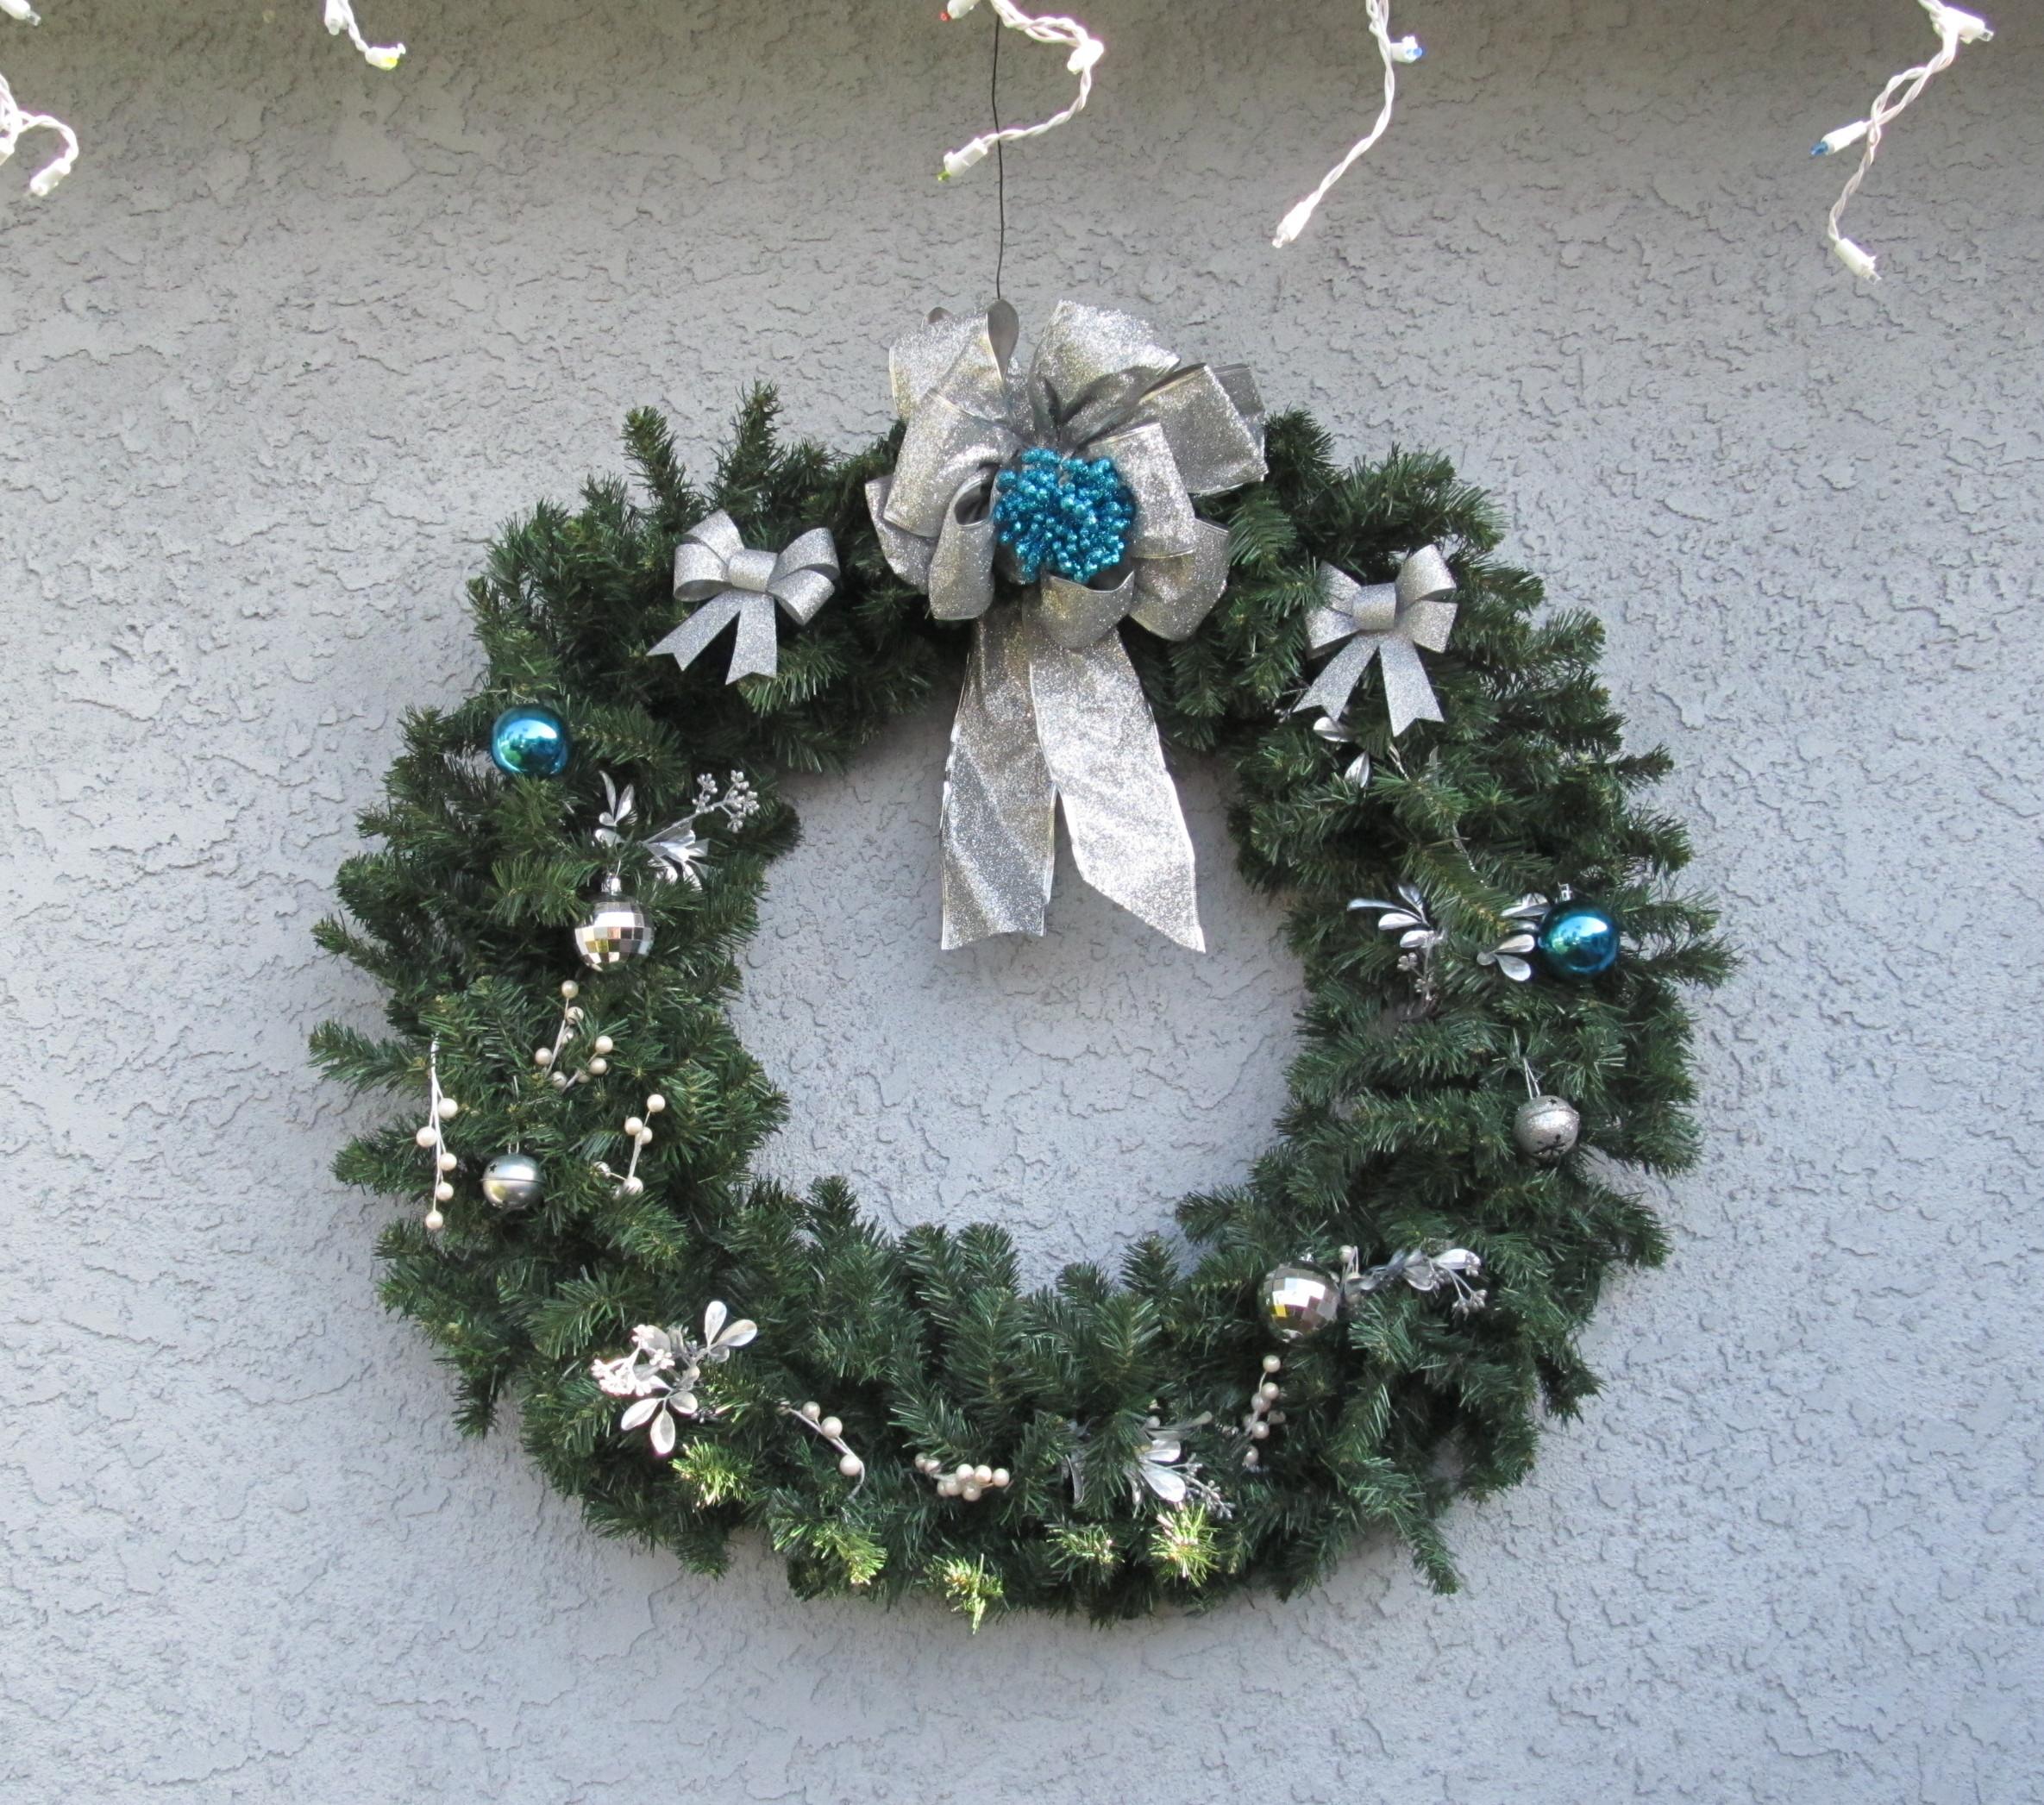 Outdoor Holiday Decorating Idea